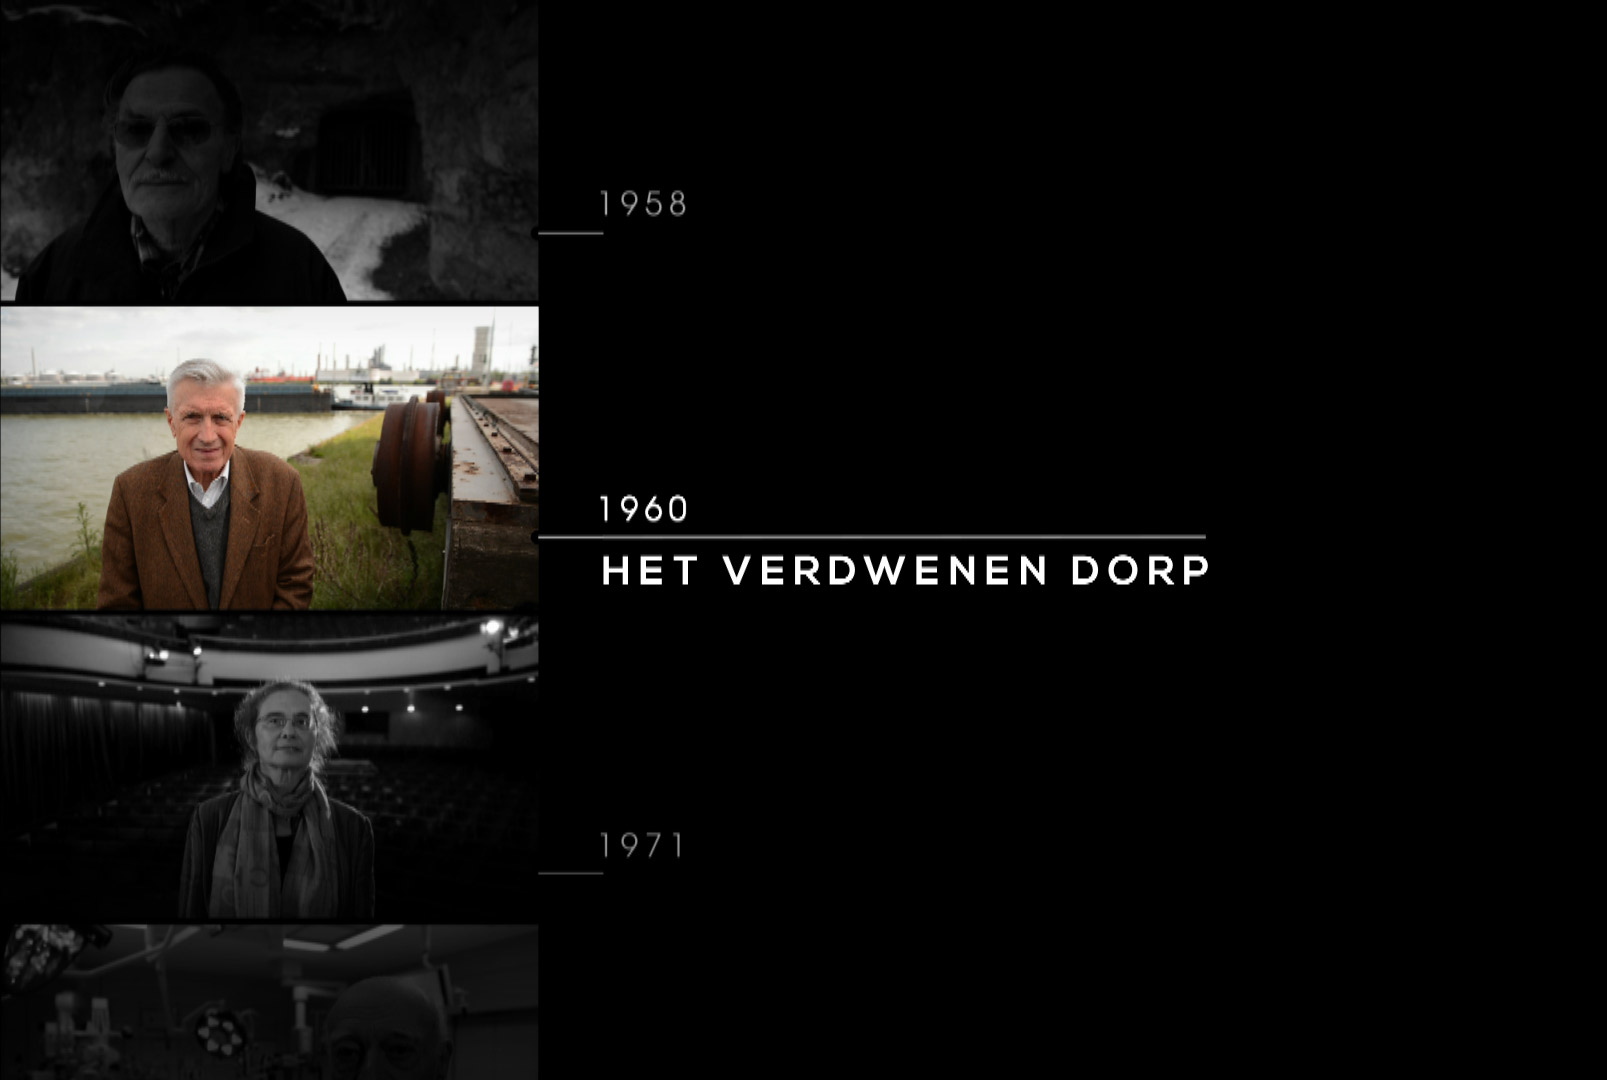 http://www.nooitmeerdezelfde.be/wp-content/uploads/2013/08/7b.jpg